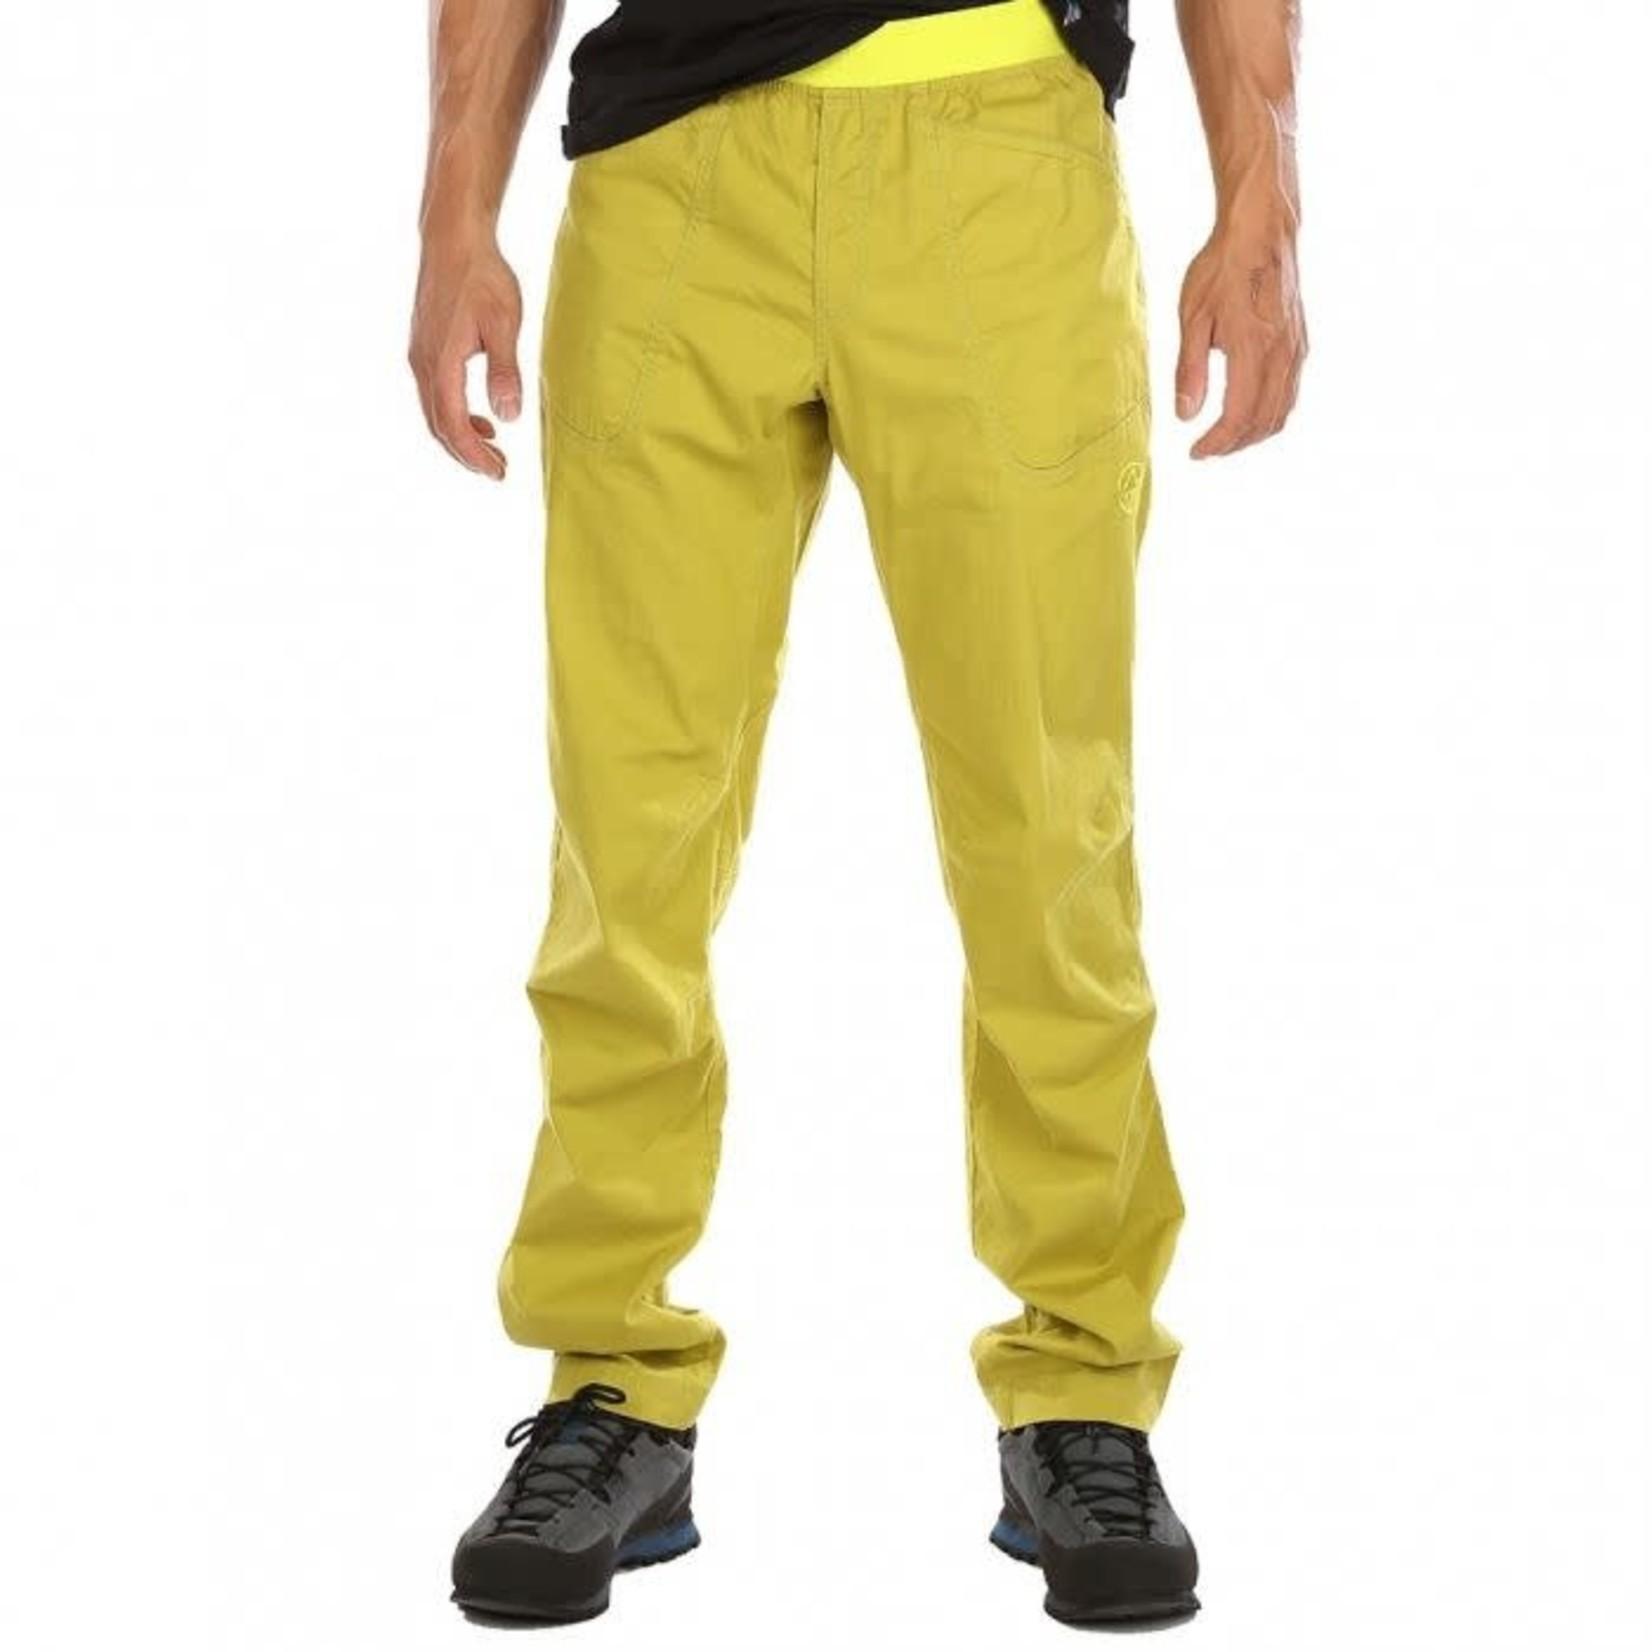 La Sportiva Pantalons La Sportiva Roots - Homme